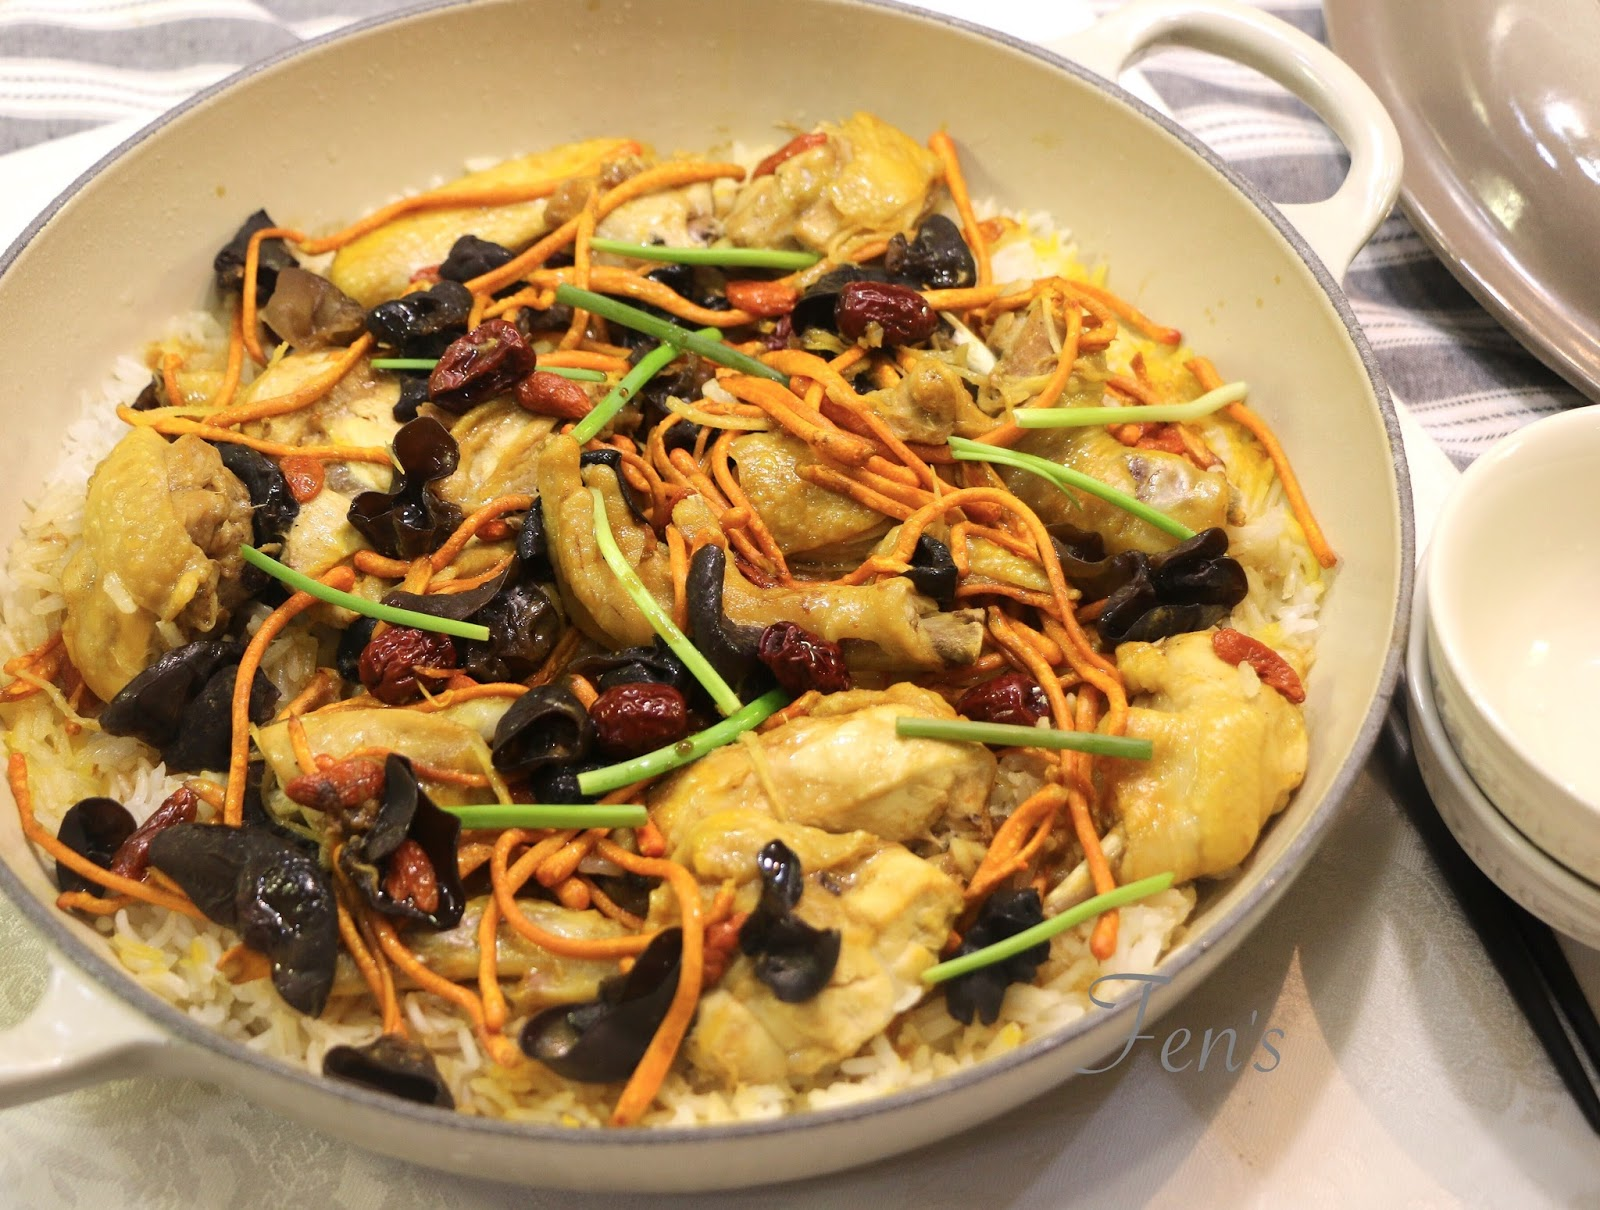 Fen's Cooking: 鮮蟲草花焗雞飯